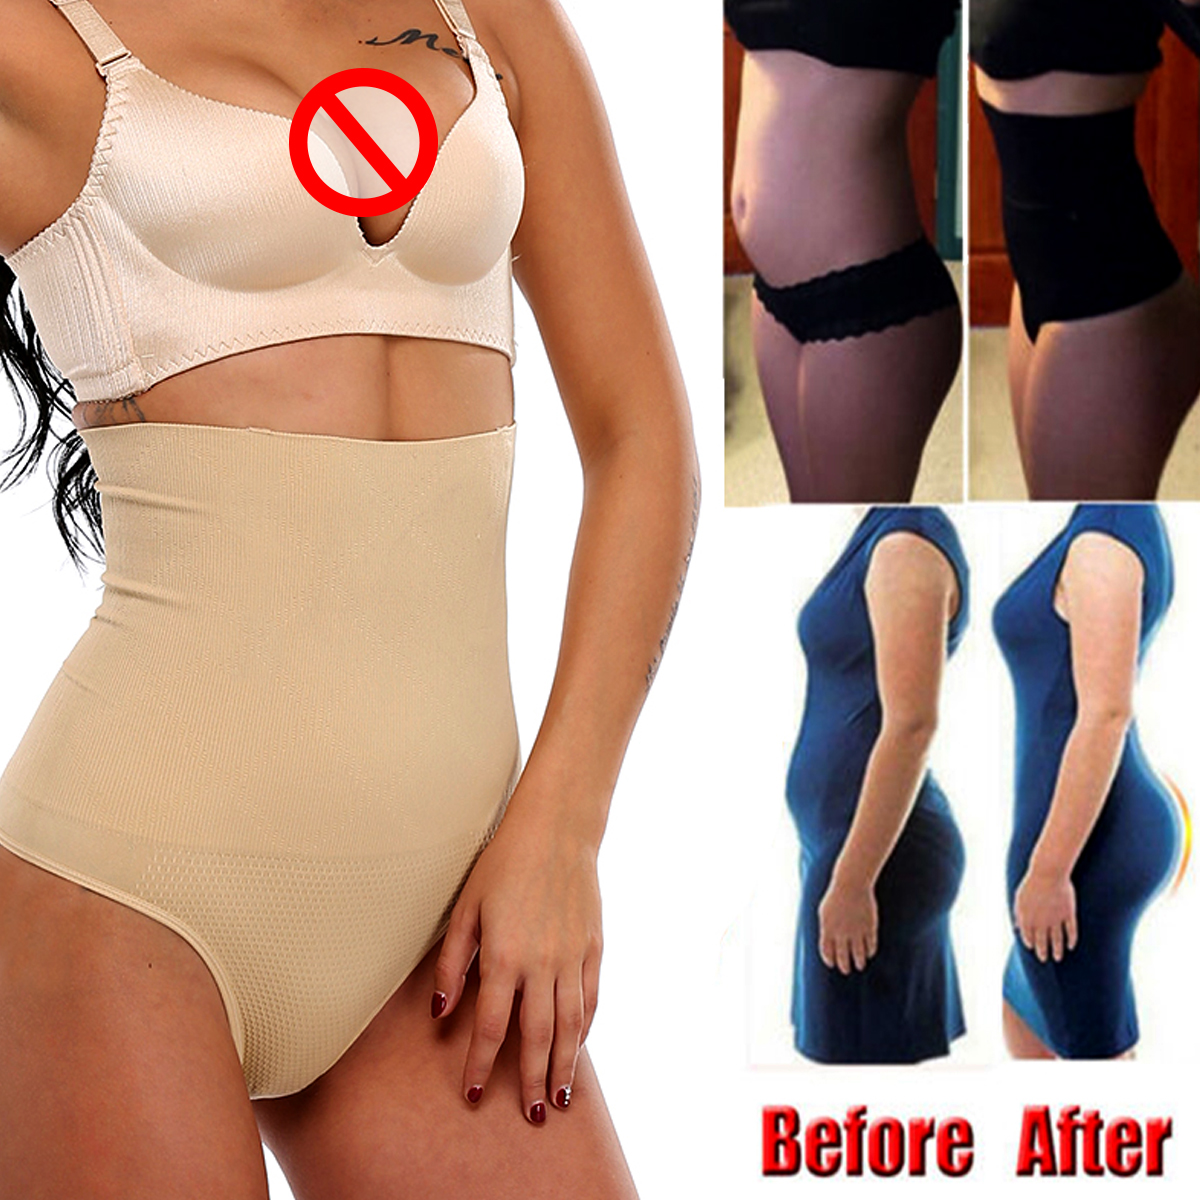 Women Body Shaper Panties Tummy Slimming Shapewear Girdle Underwear Shaping Shorts Breathable